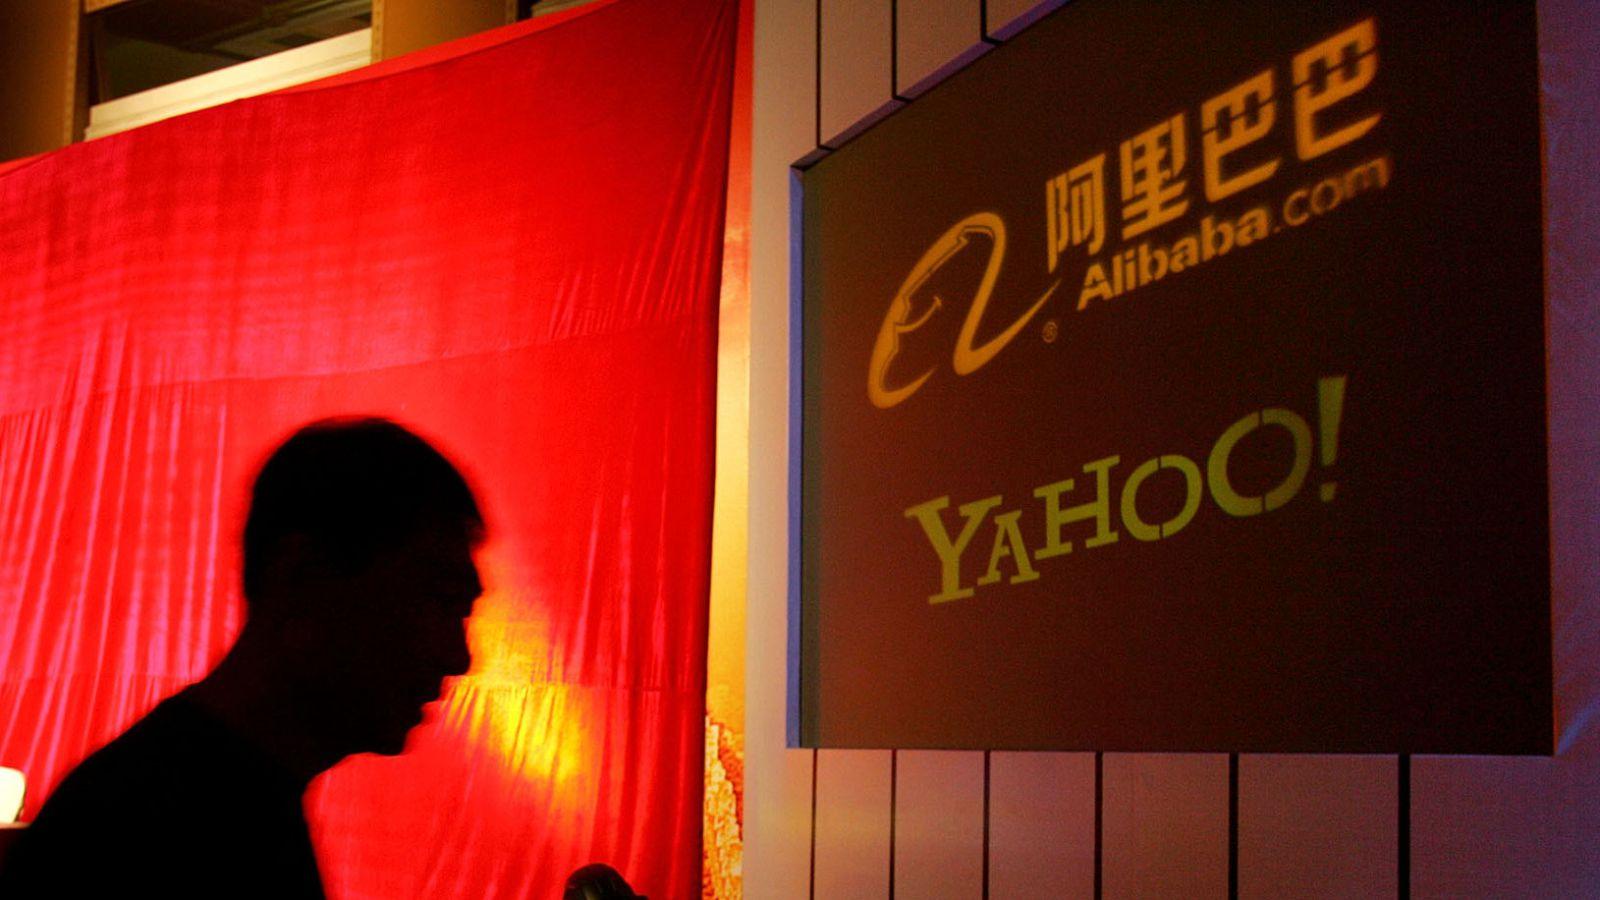 Yahoo slideshow 5 - Alibaba